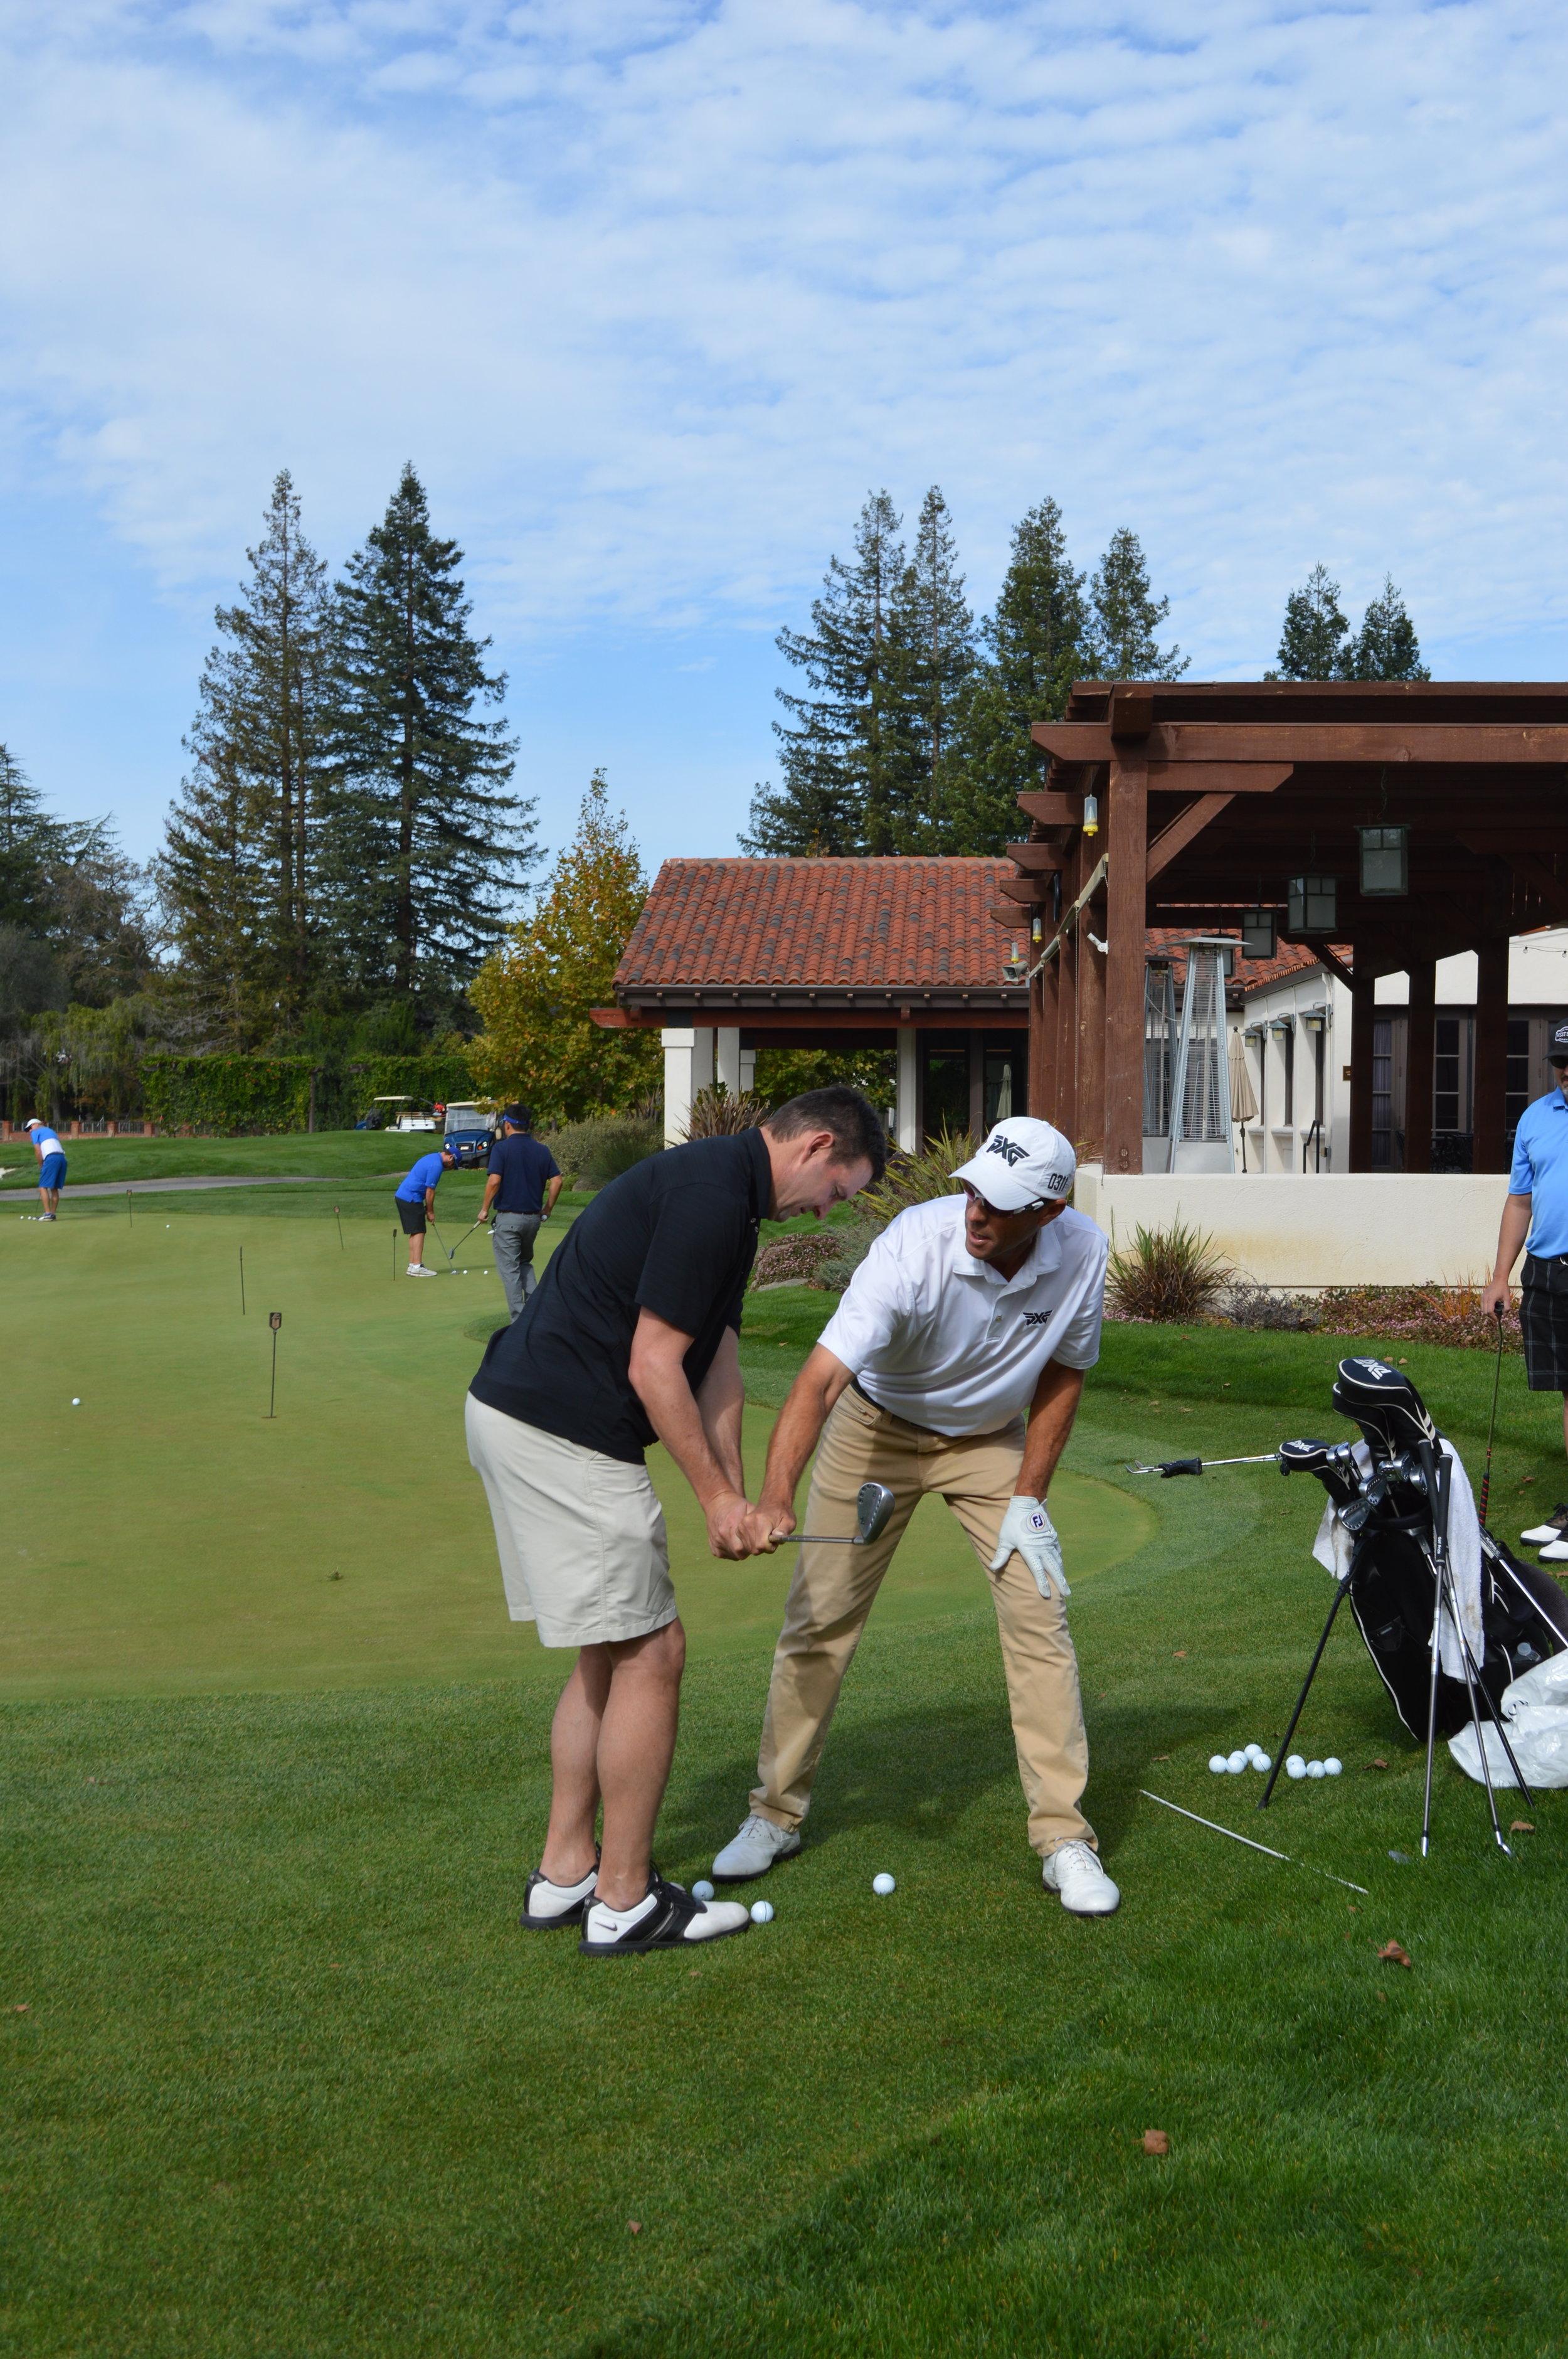 Golf Pro Jeff Brehaut instructing Joe Cannon